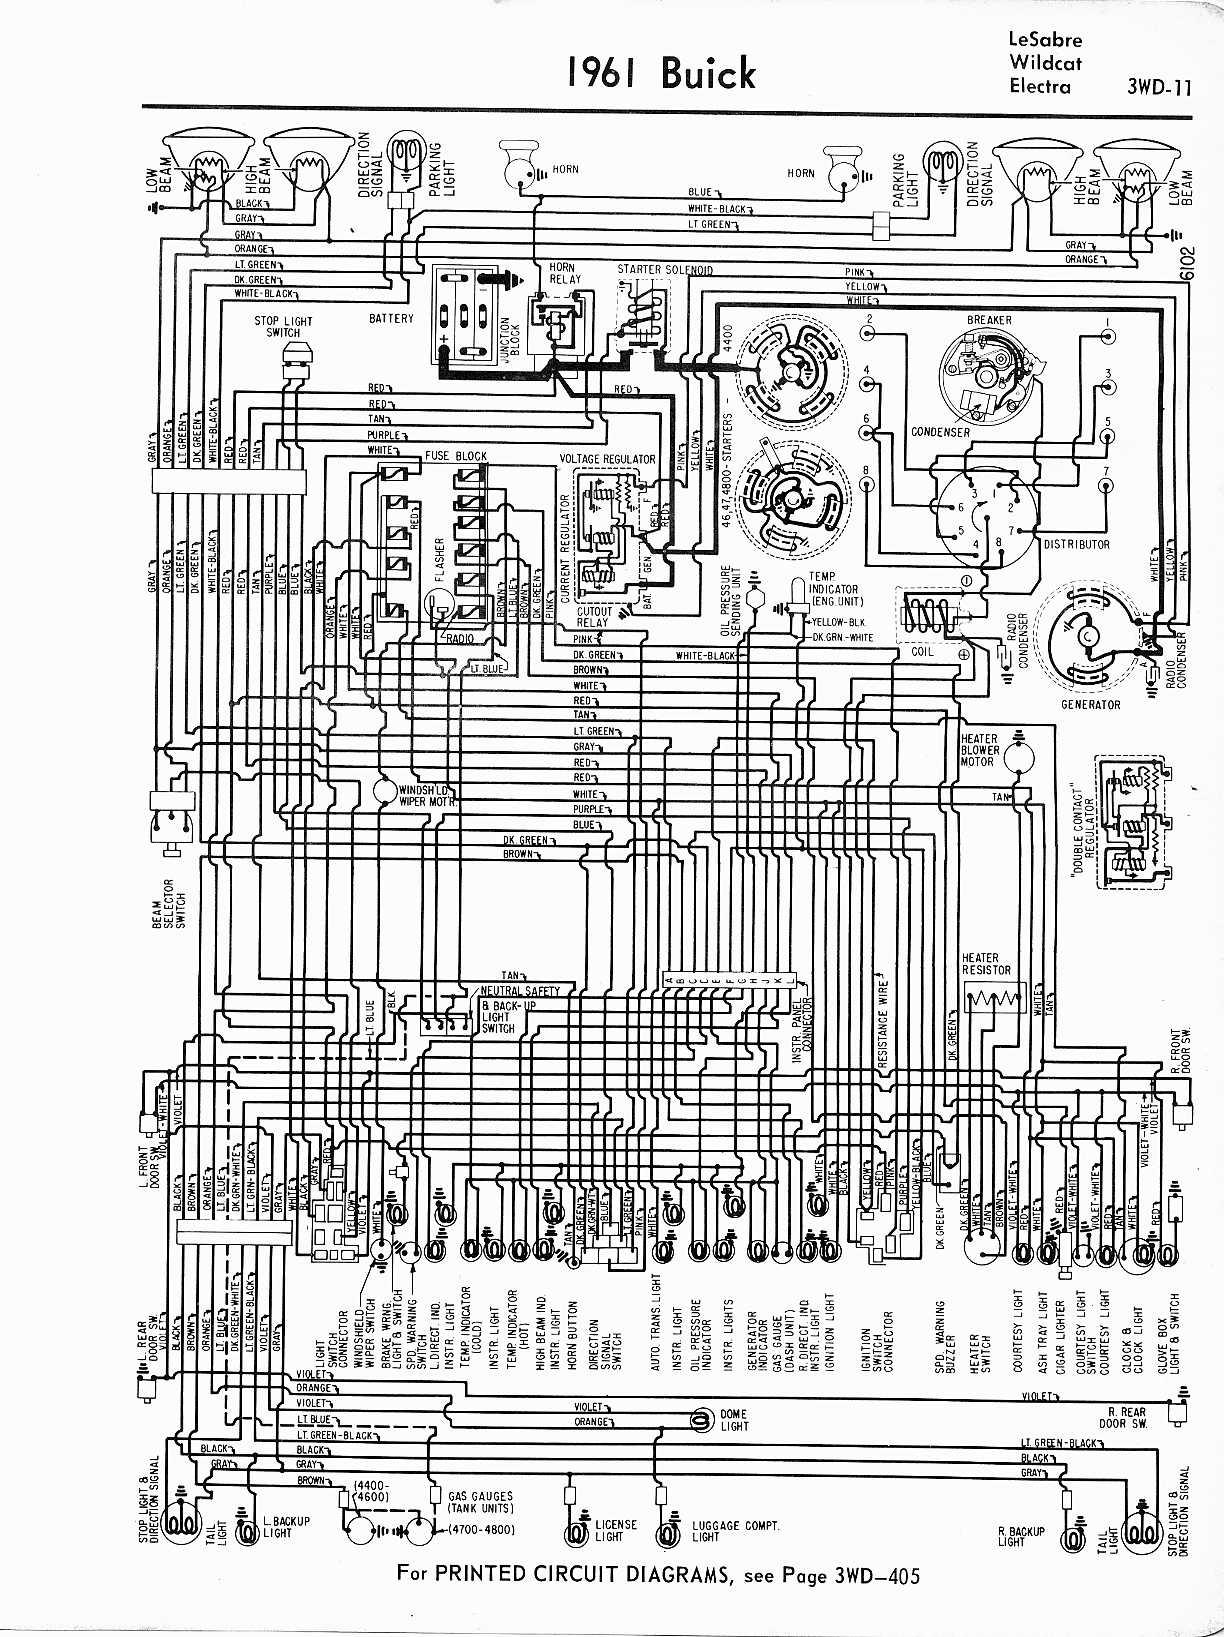 1990 Buick Reatta Wiring Diagram Lr4 Fuse Box Bege Wiring Diagram